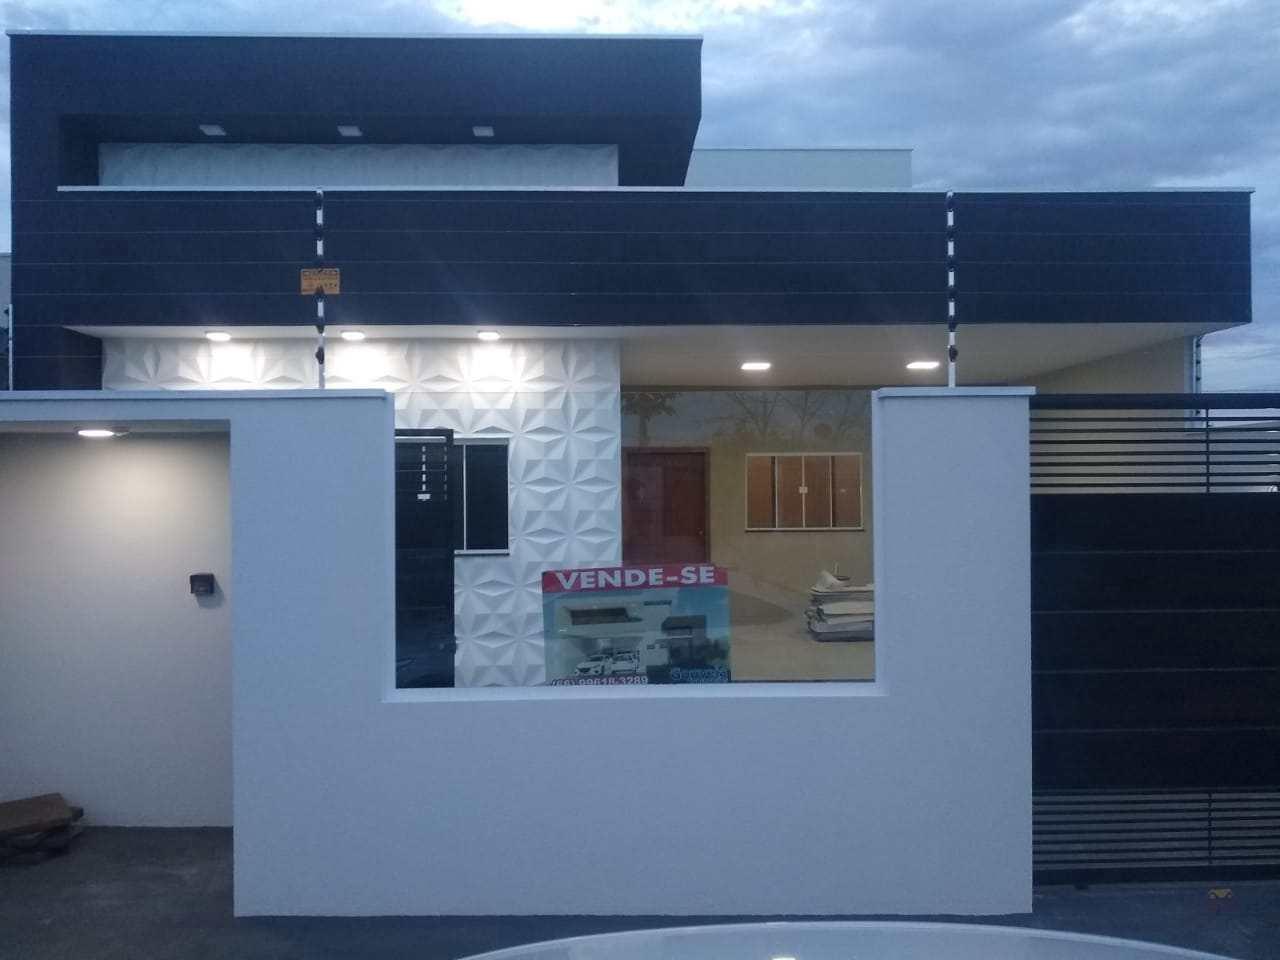 Casa com 2 dorms, Buritis III, Primavera do Leste - R$ 425 mil, Cod: 304